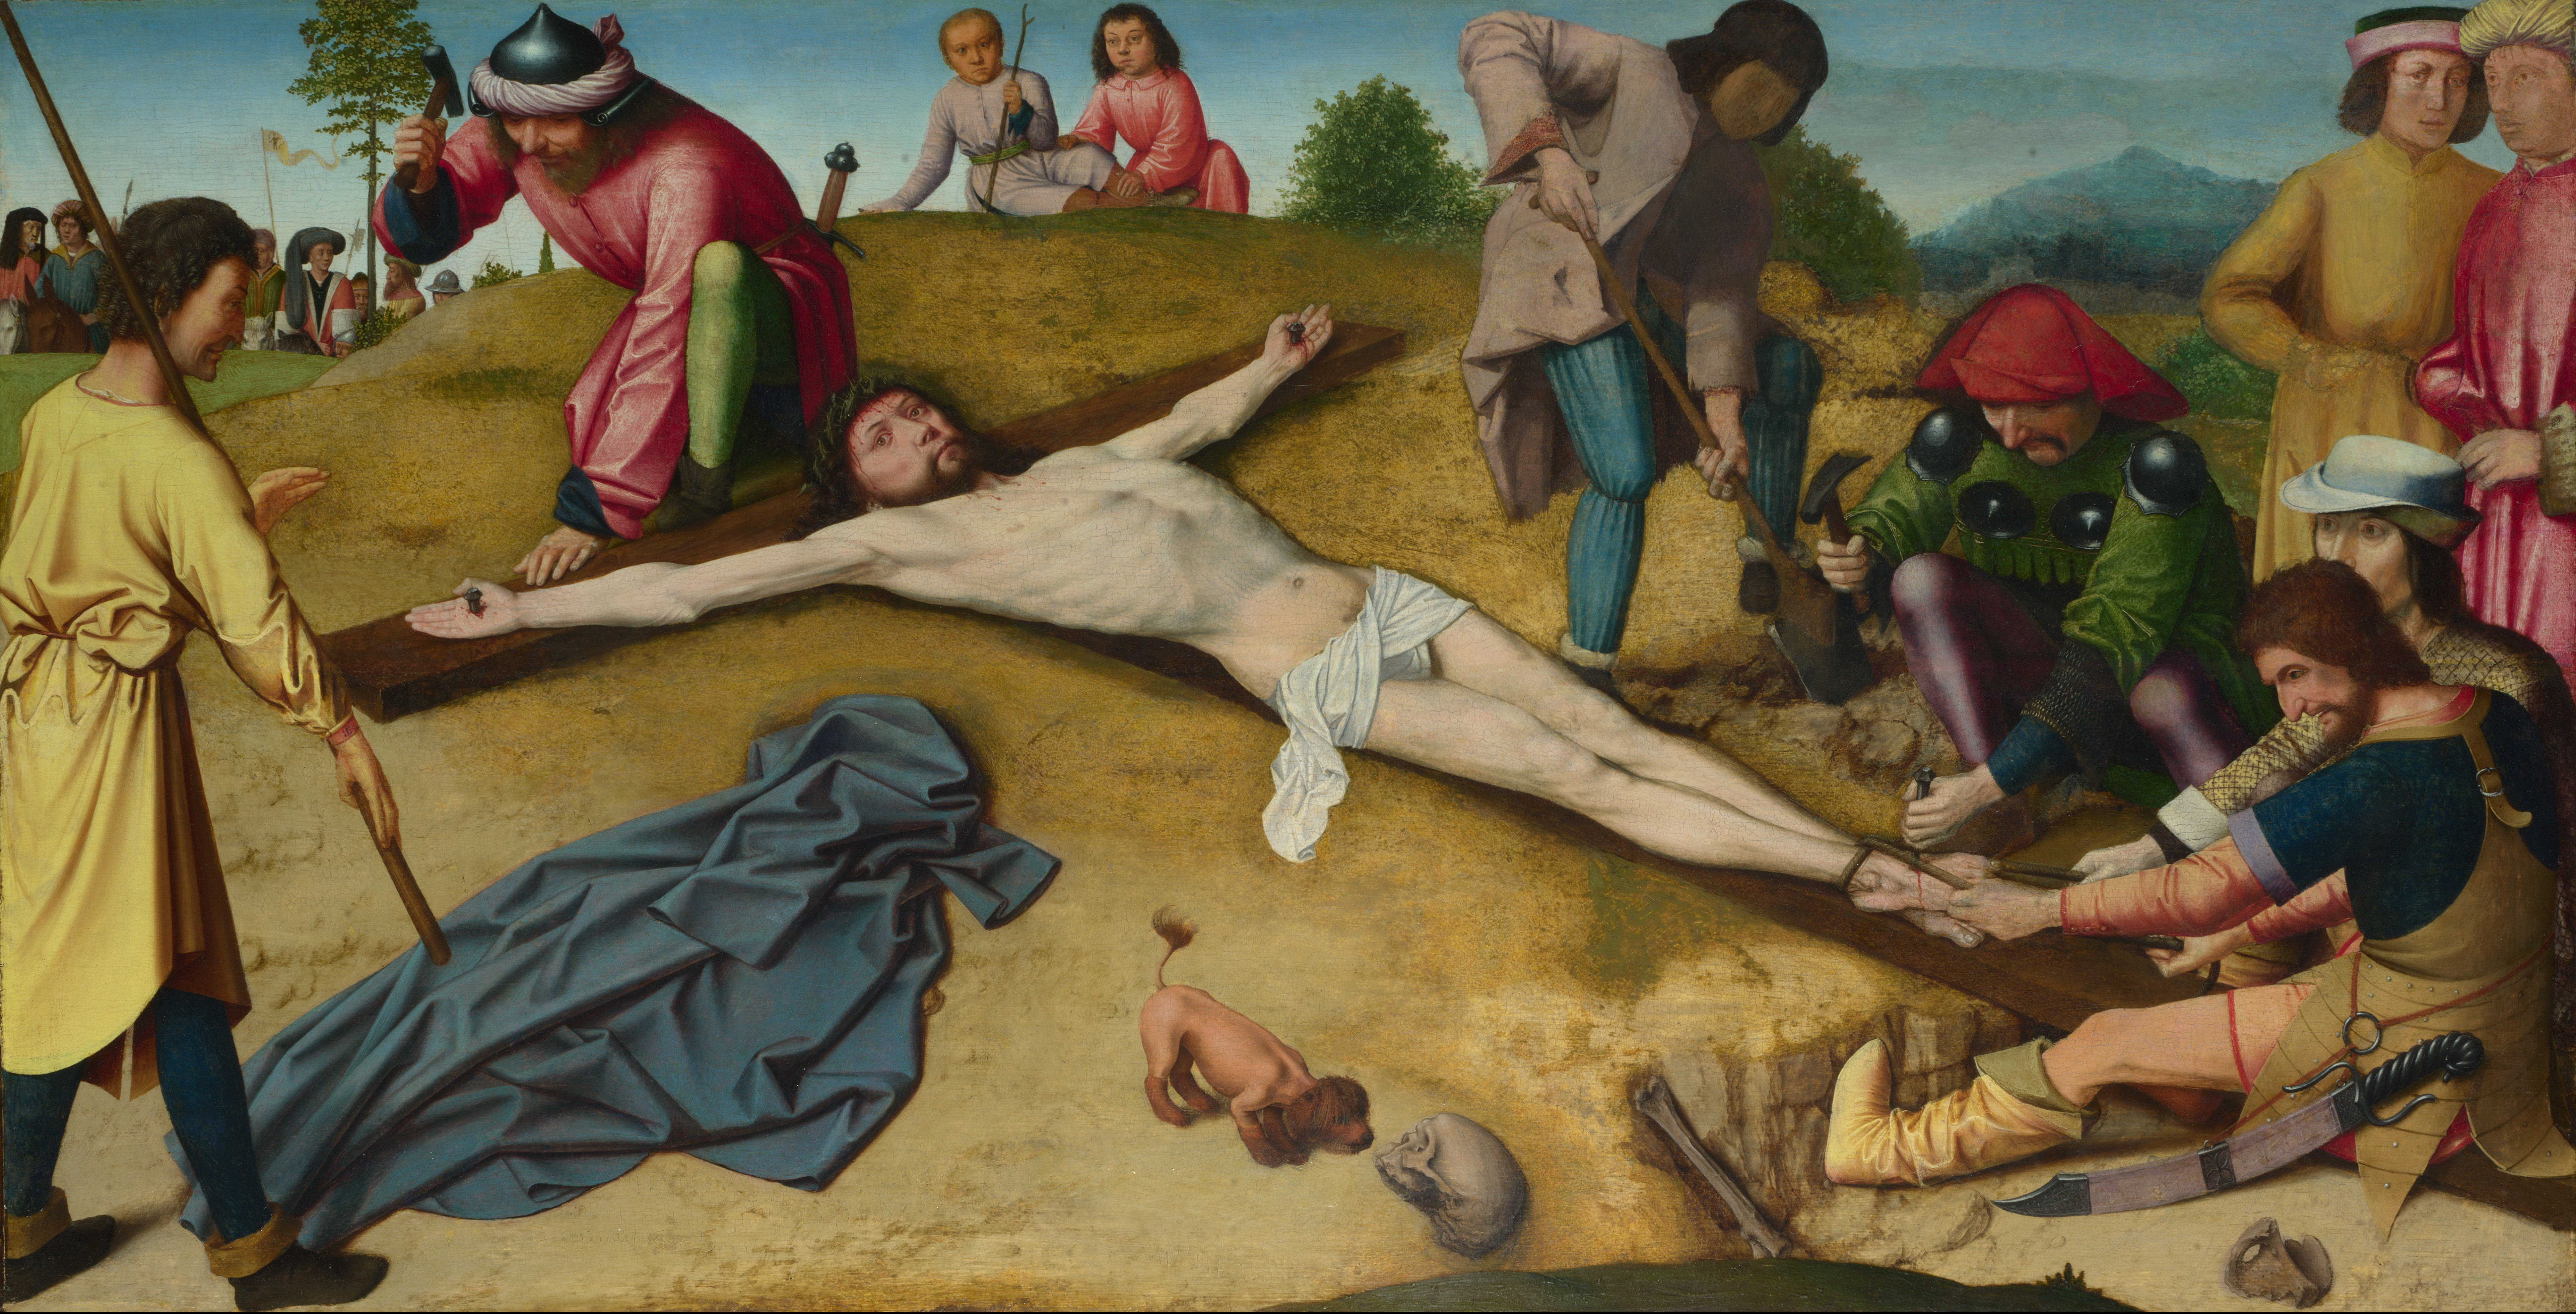 File:David Christ Nailed to the Cross.jpg - Wikimedia Commons